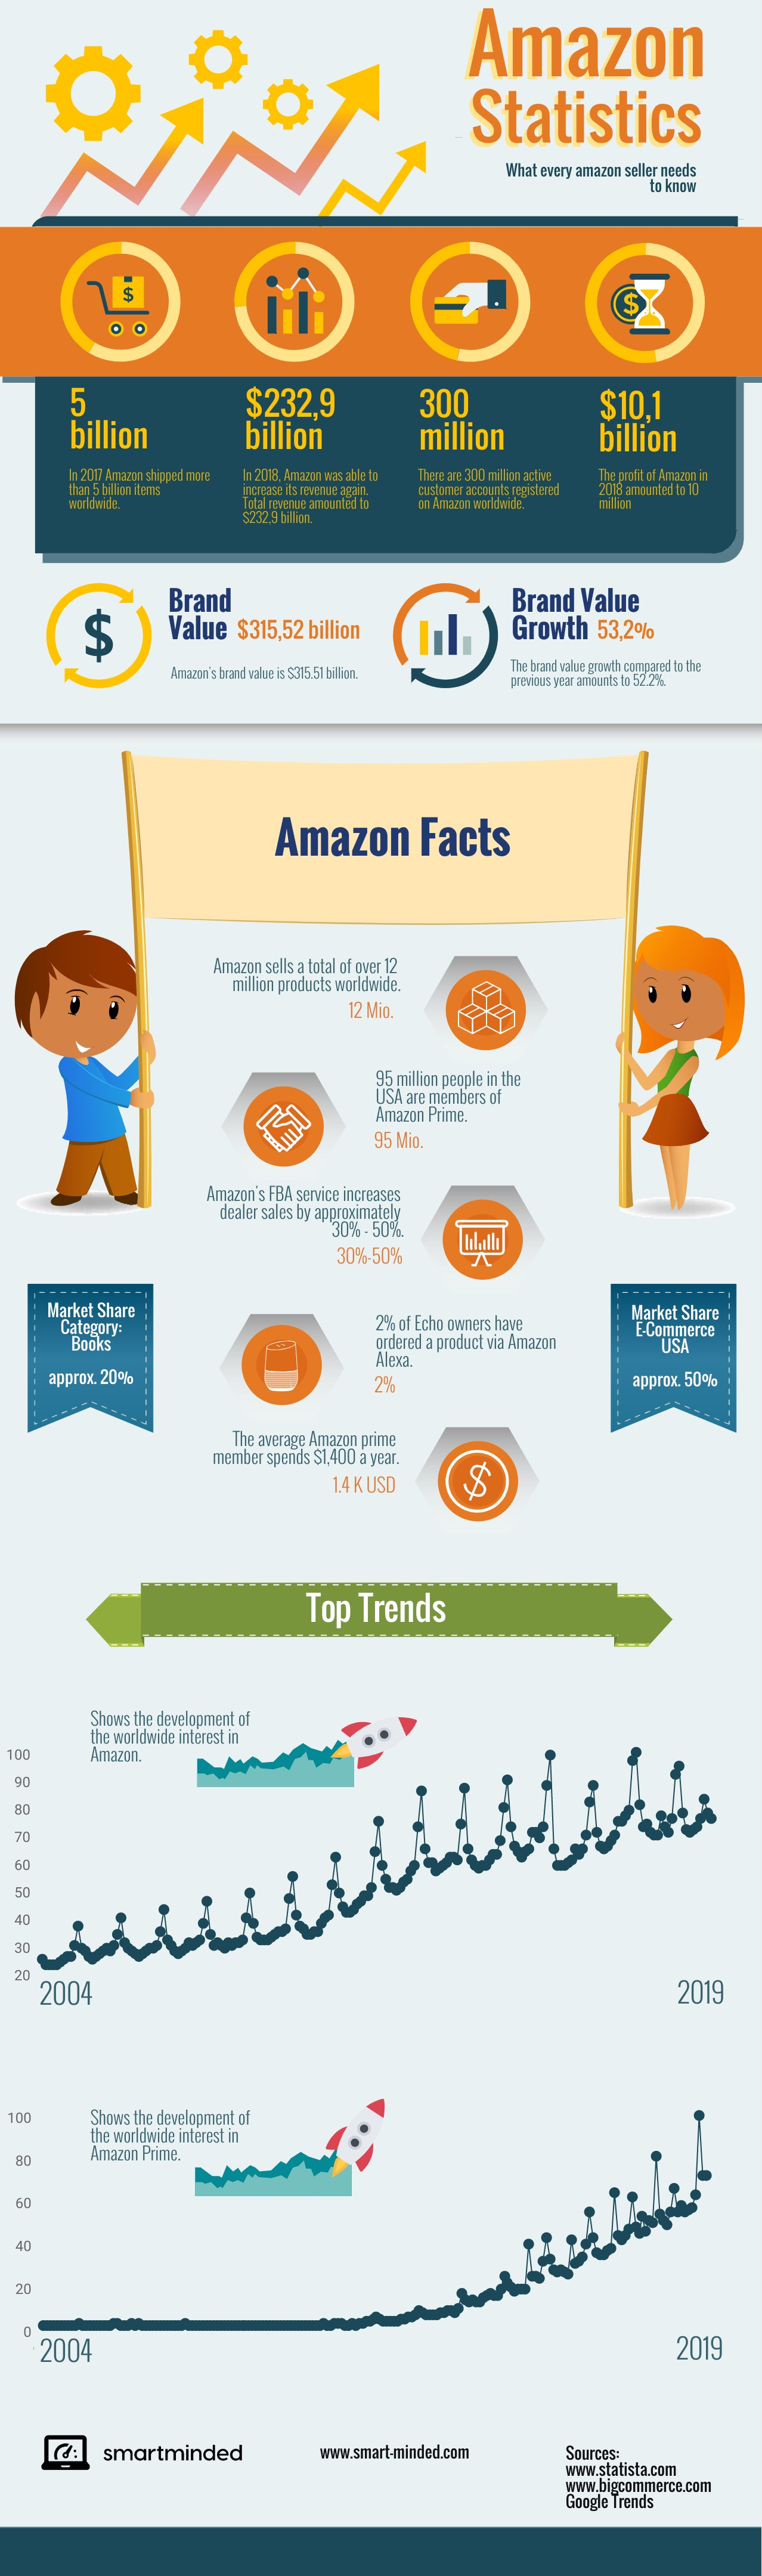 Amazon Statistics info